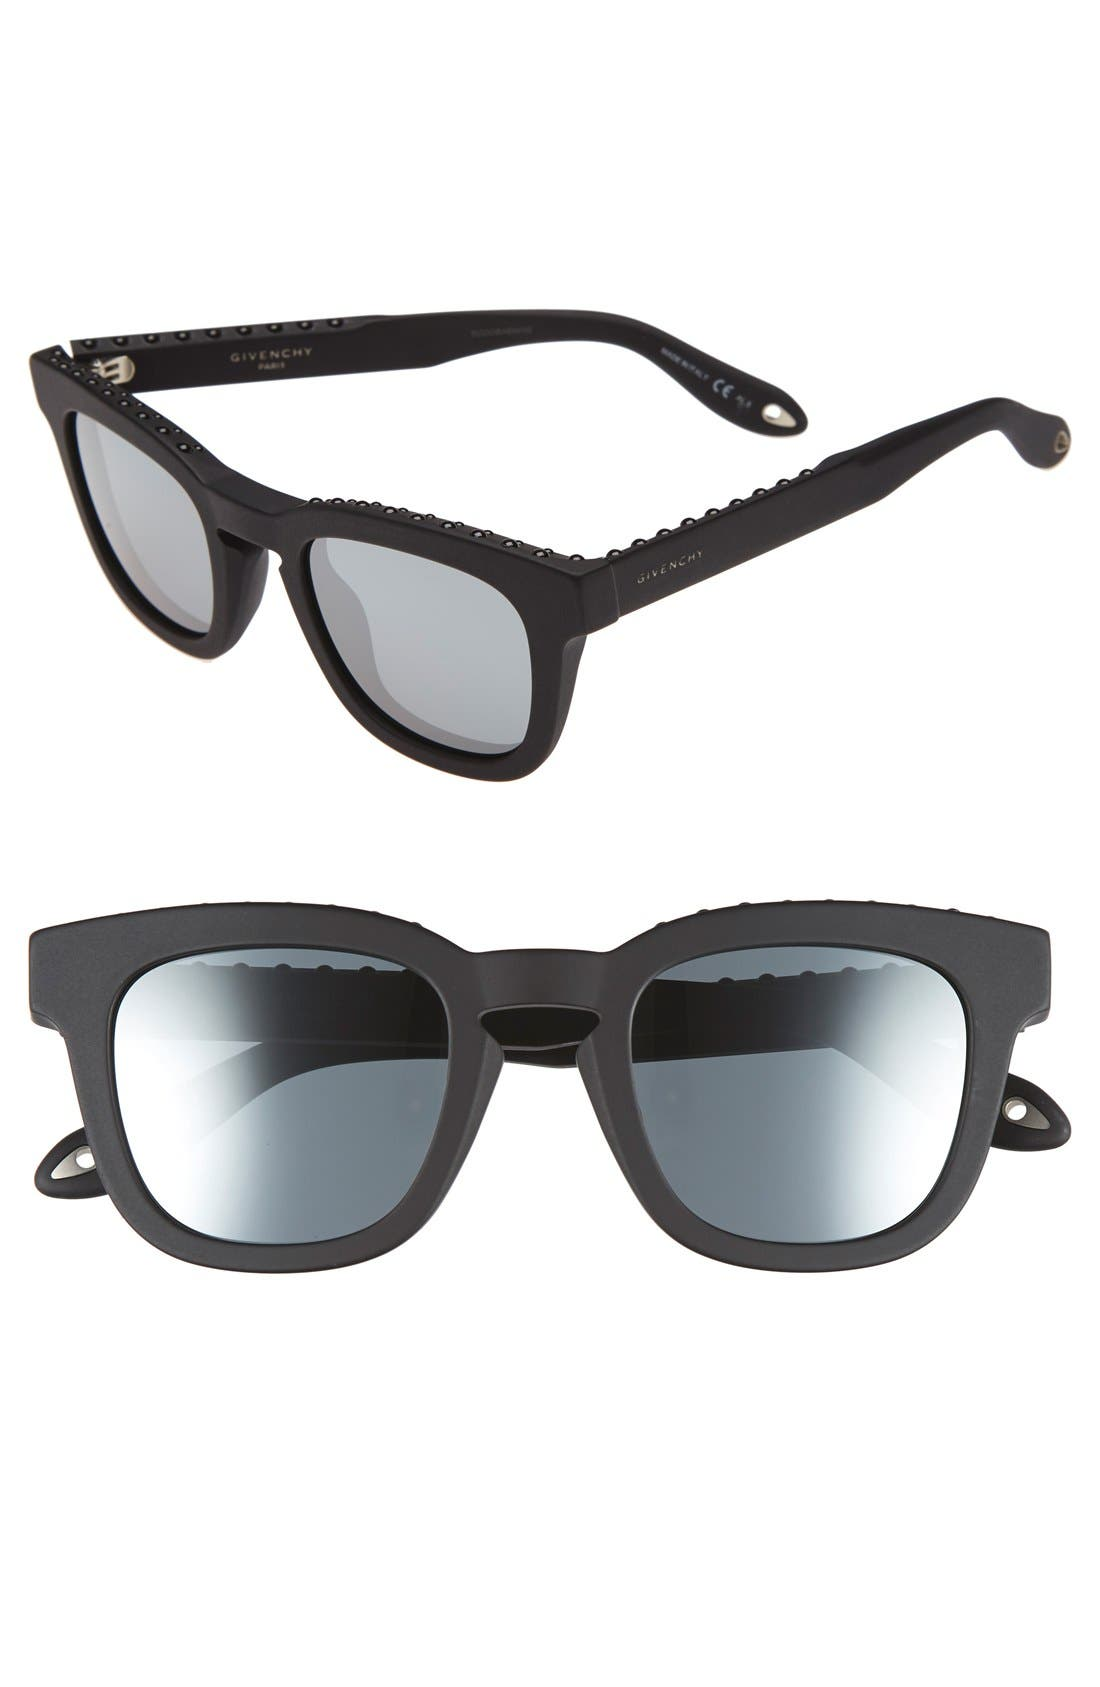 48mm Sunglasses,                             Main thumbnail 1, color,                             001